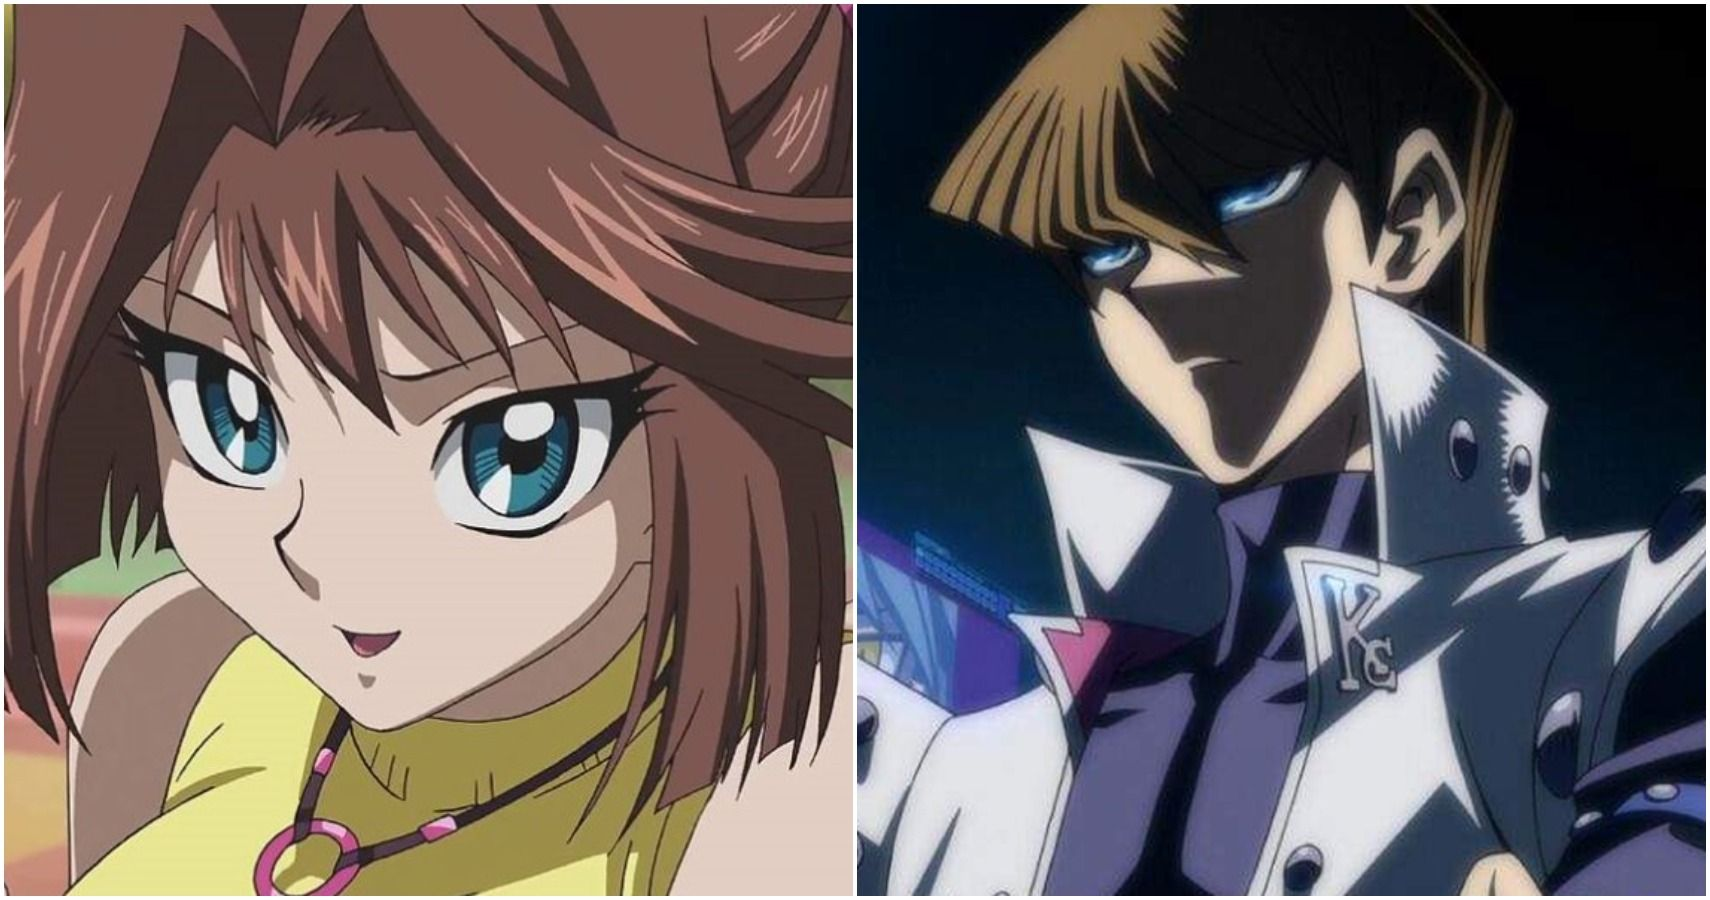 dark-magician-girl-yu-gi-oh-pyramid-of-light-024 • Azumi.Moe